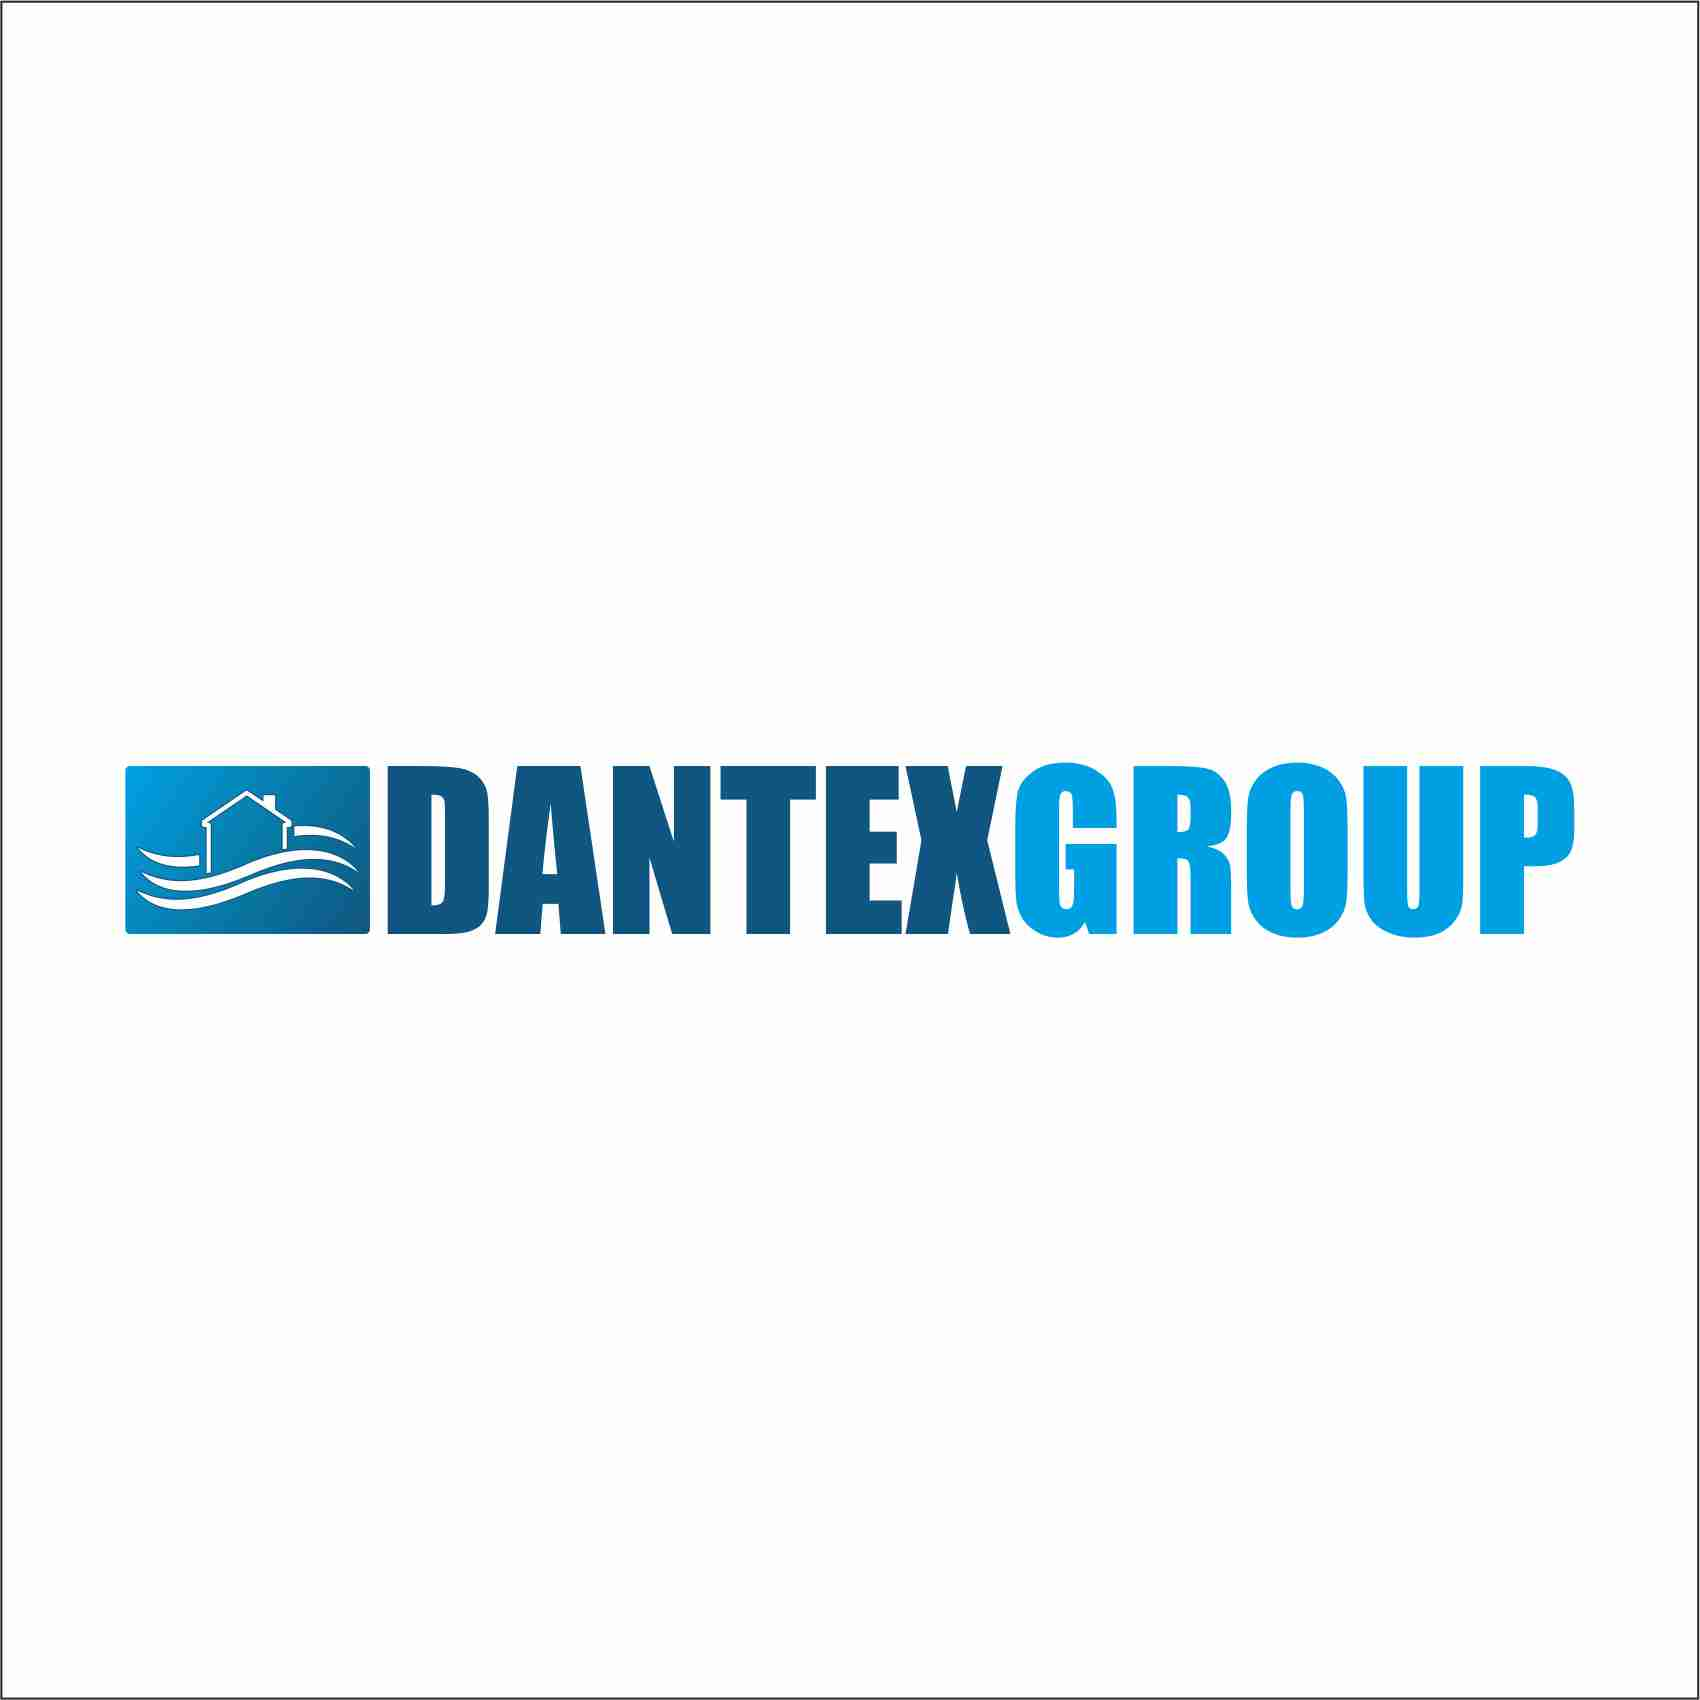 Конкурс на разработку логотипа для компании Dantex Group  фото f_7845c0554be7c22d.jpg